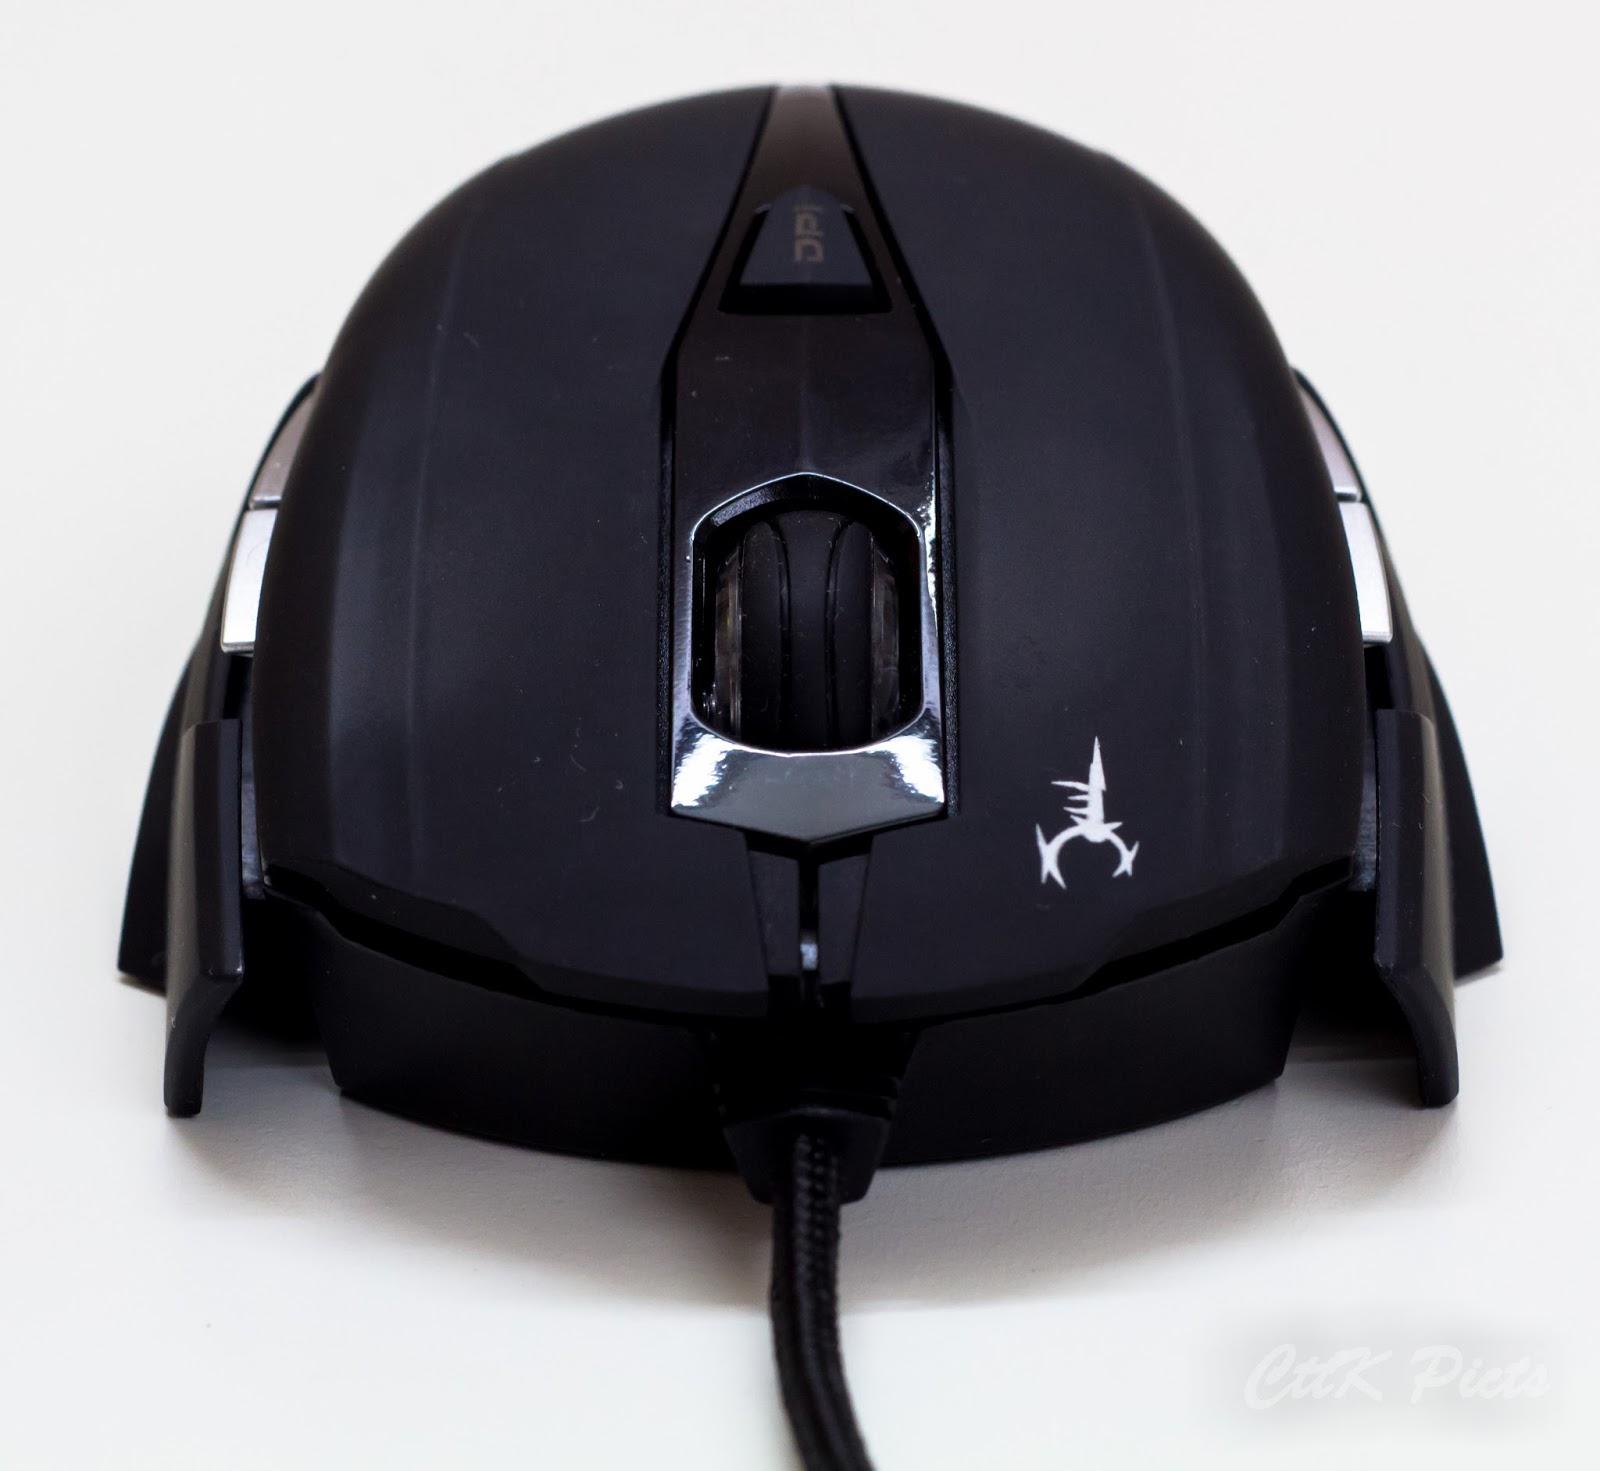 Gamdias Hades Extension Optical Gaming Mouse 63